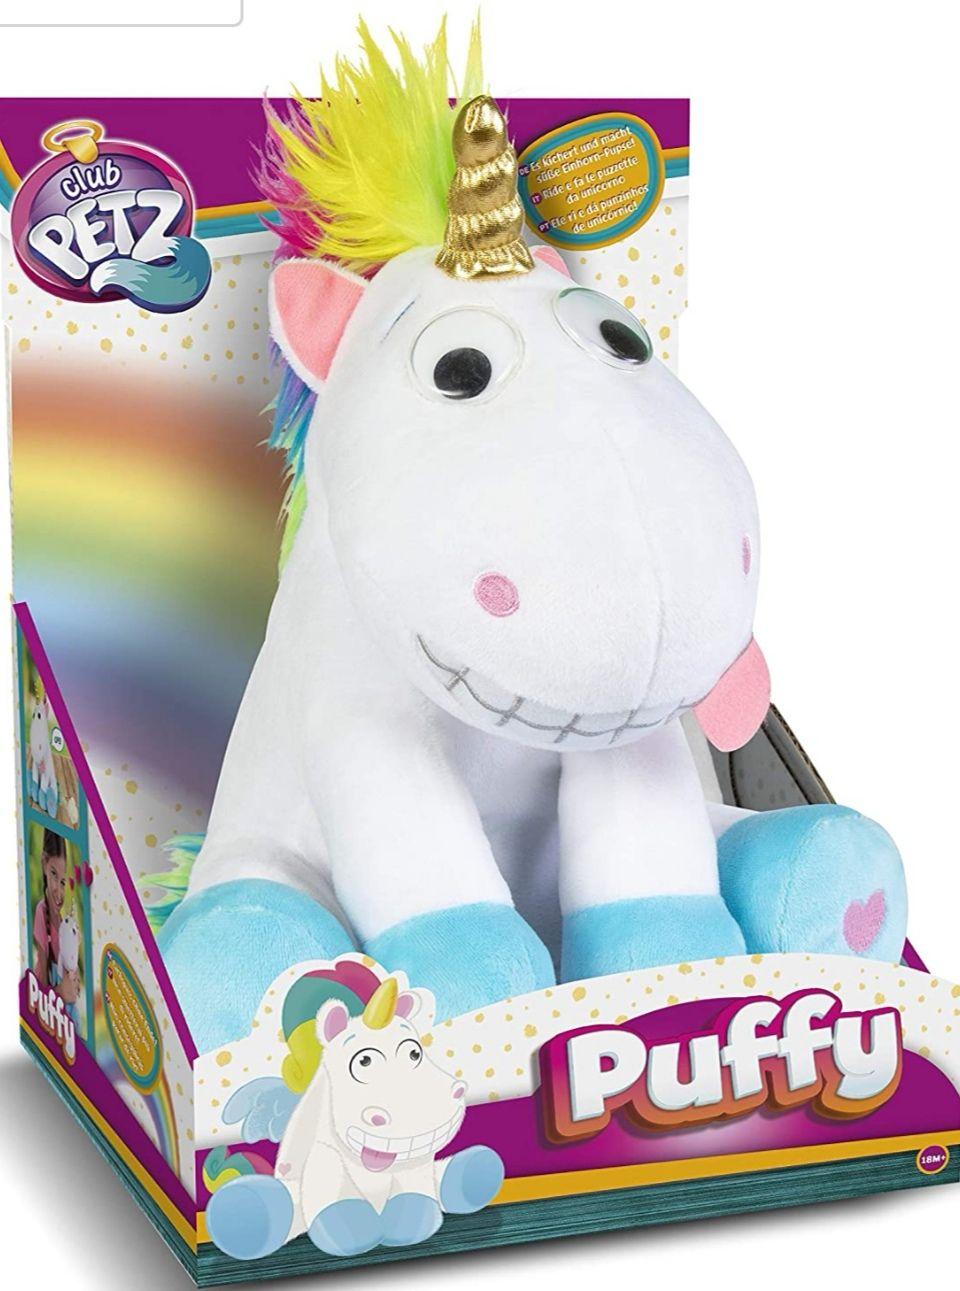 Puffy divertido peluche interactivo!